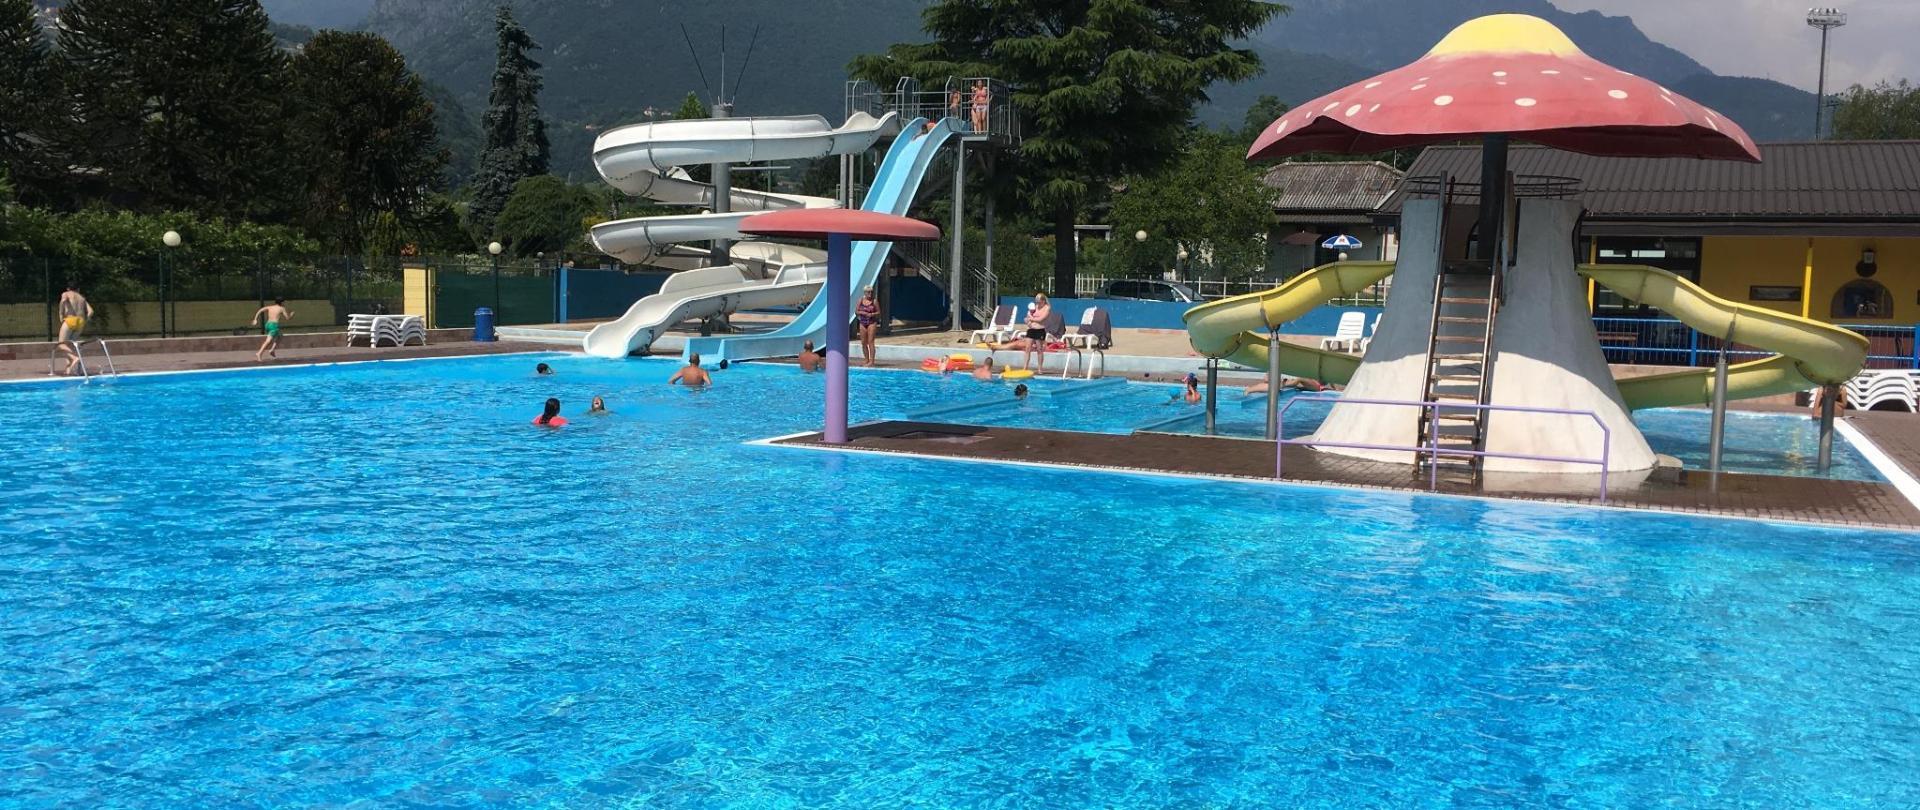 Mylooking vacanze Porlezza